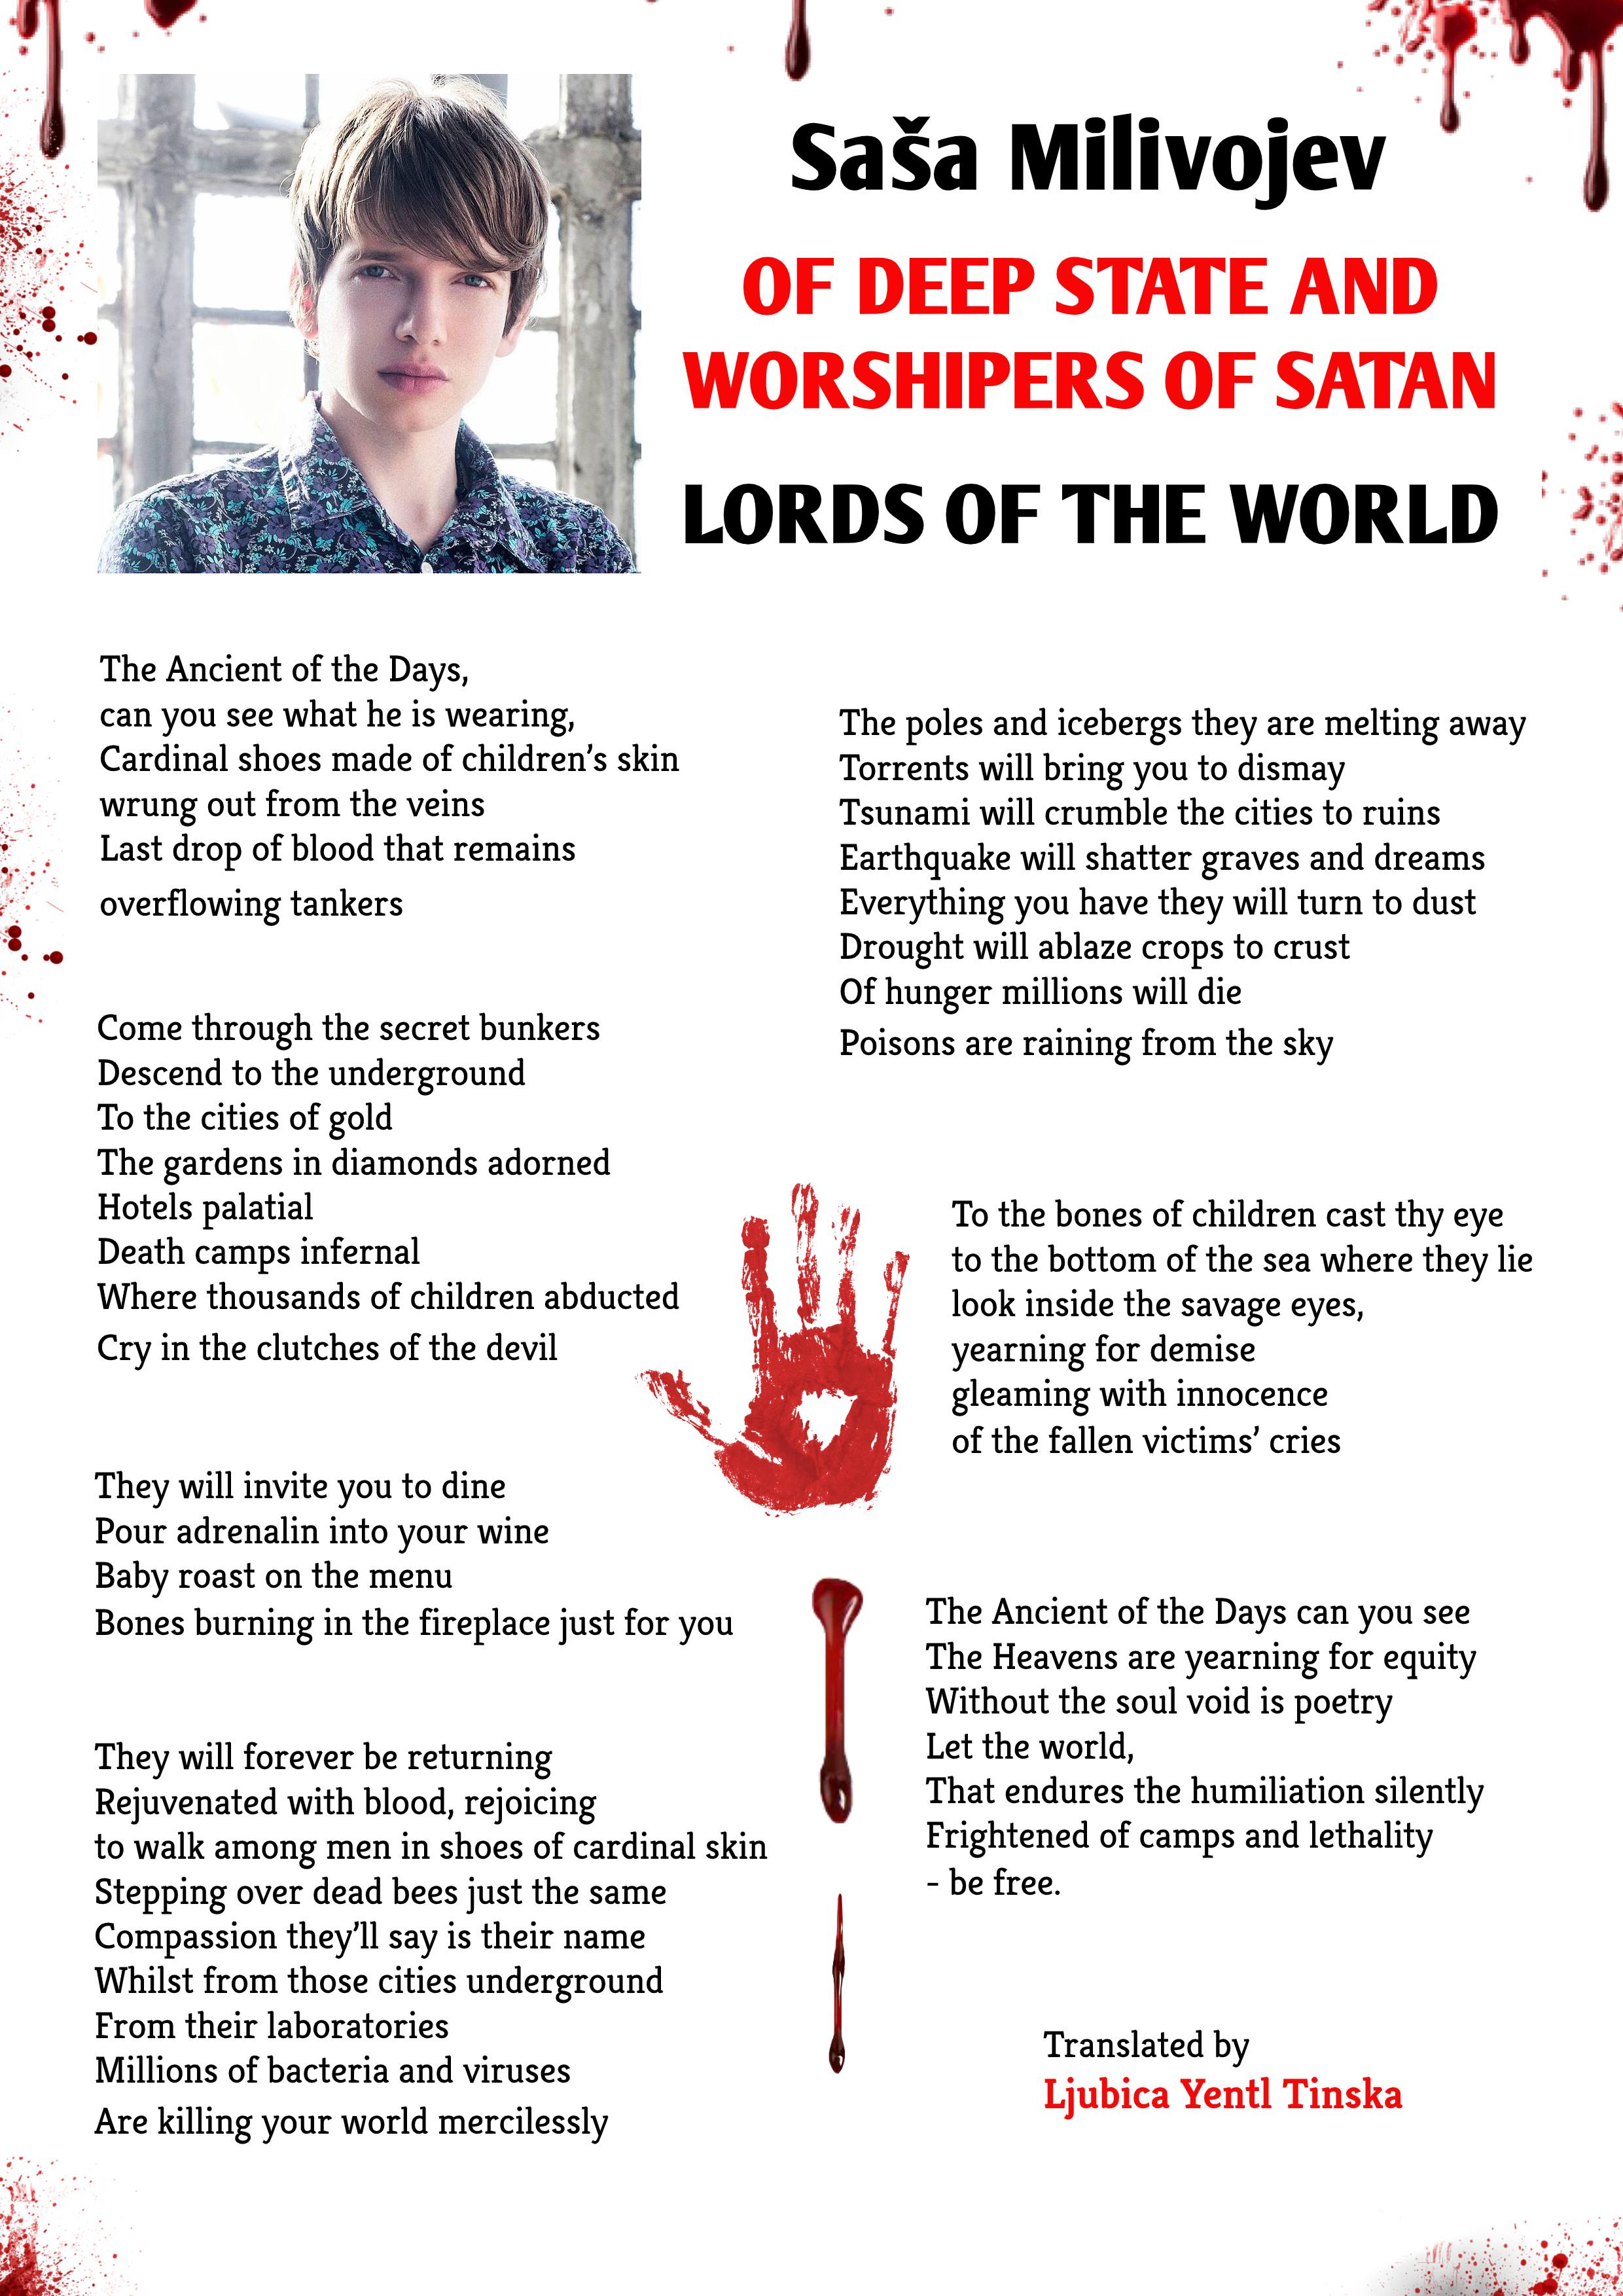 Saša Milivojev - LORDS OF THE WORLD